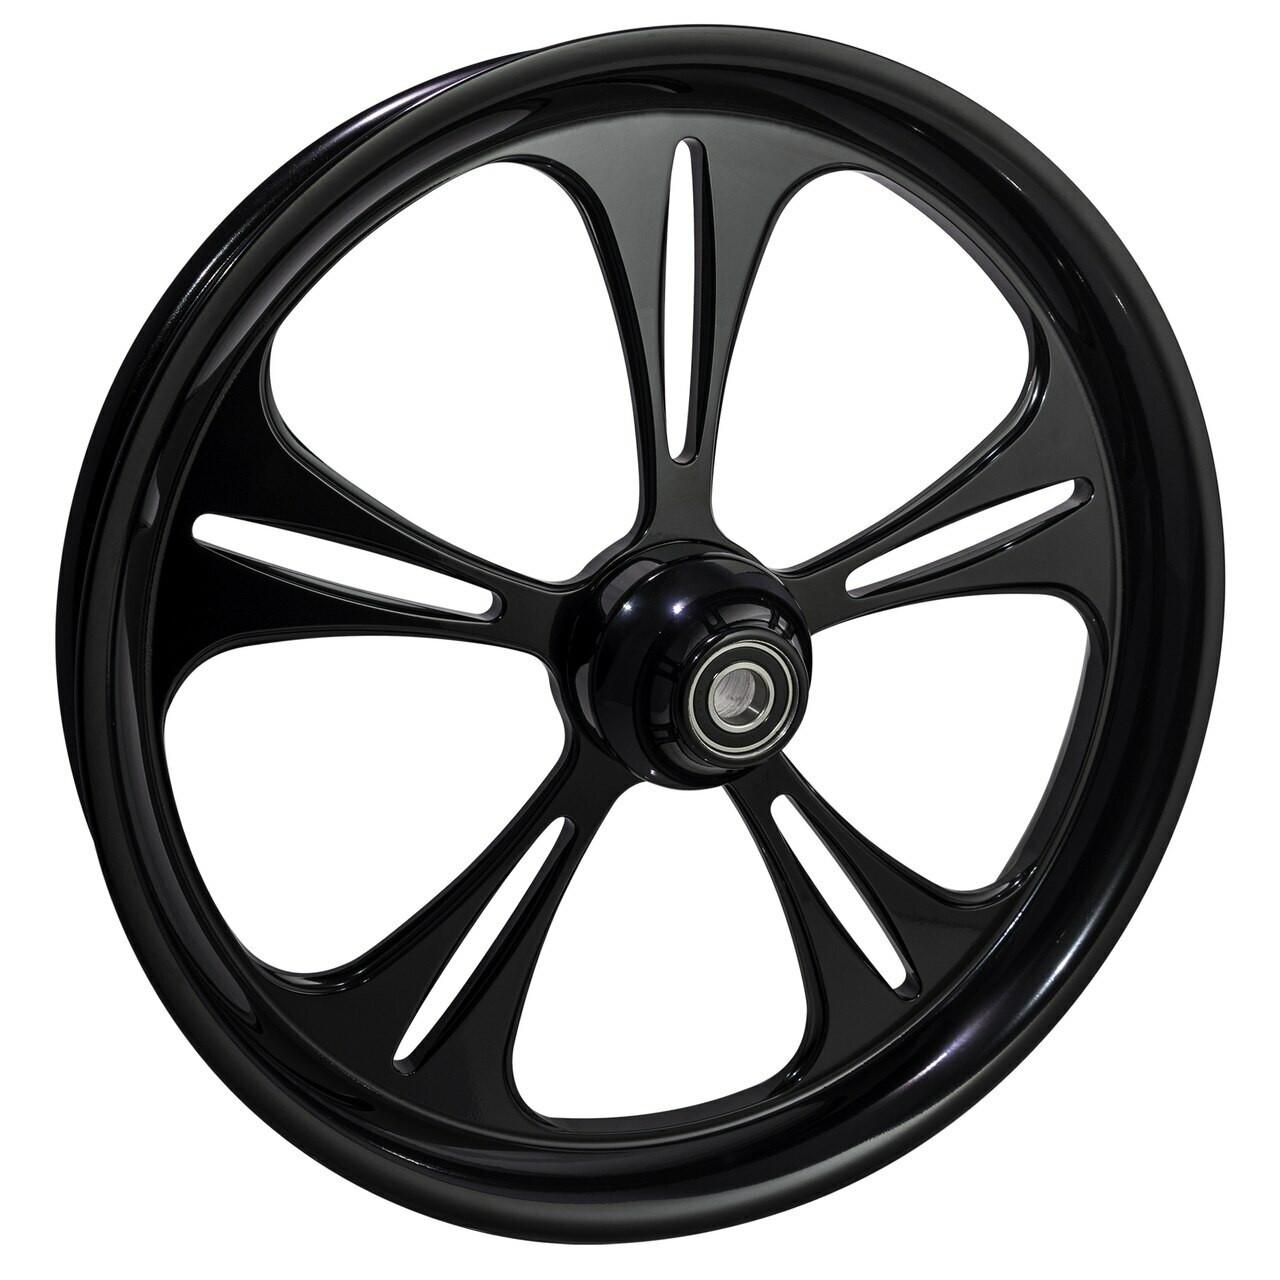 21 inch Black Road Glide Wheels by FTD Customs